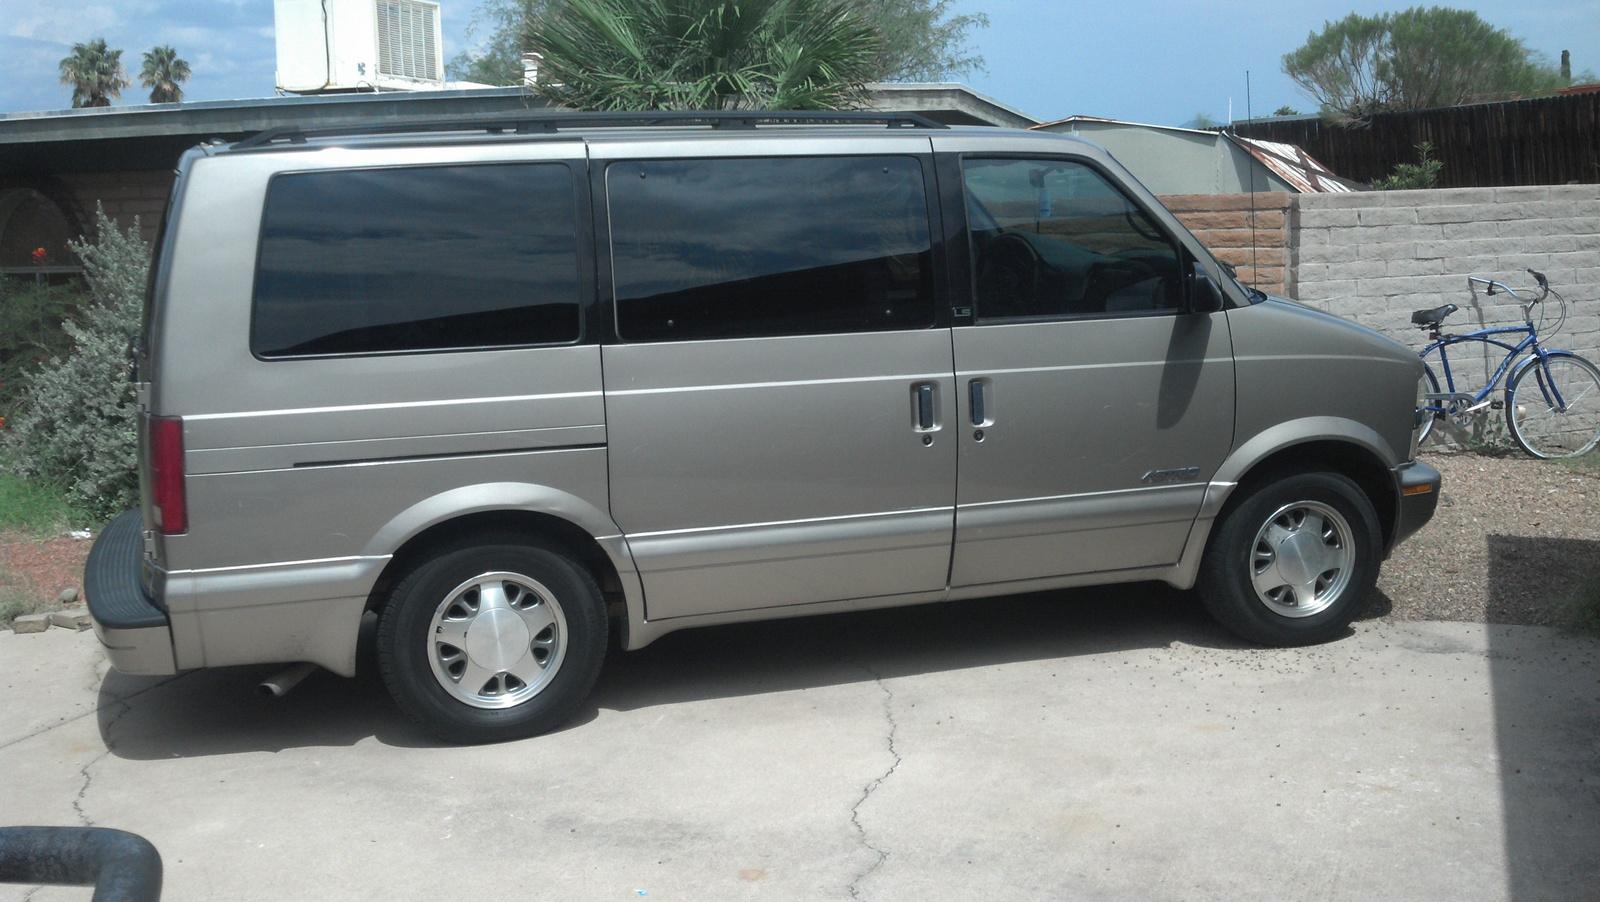 Chevrolet Astro Dr Ls Passenger Van Extended Pic